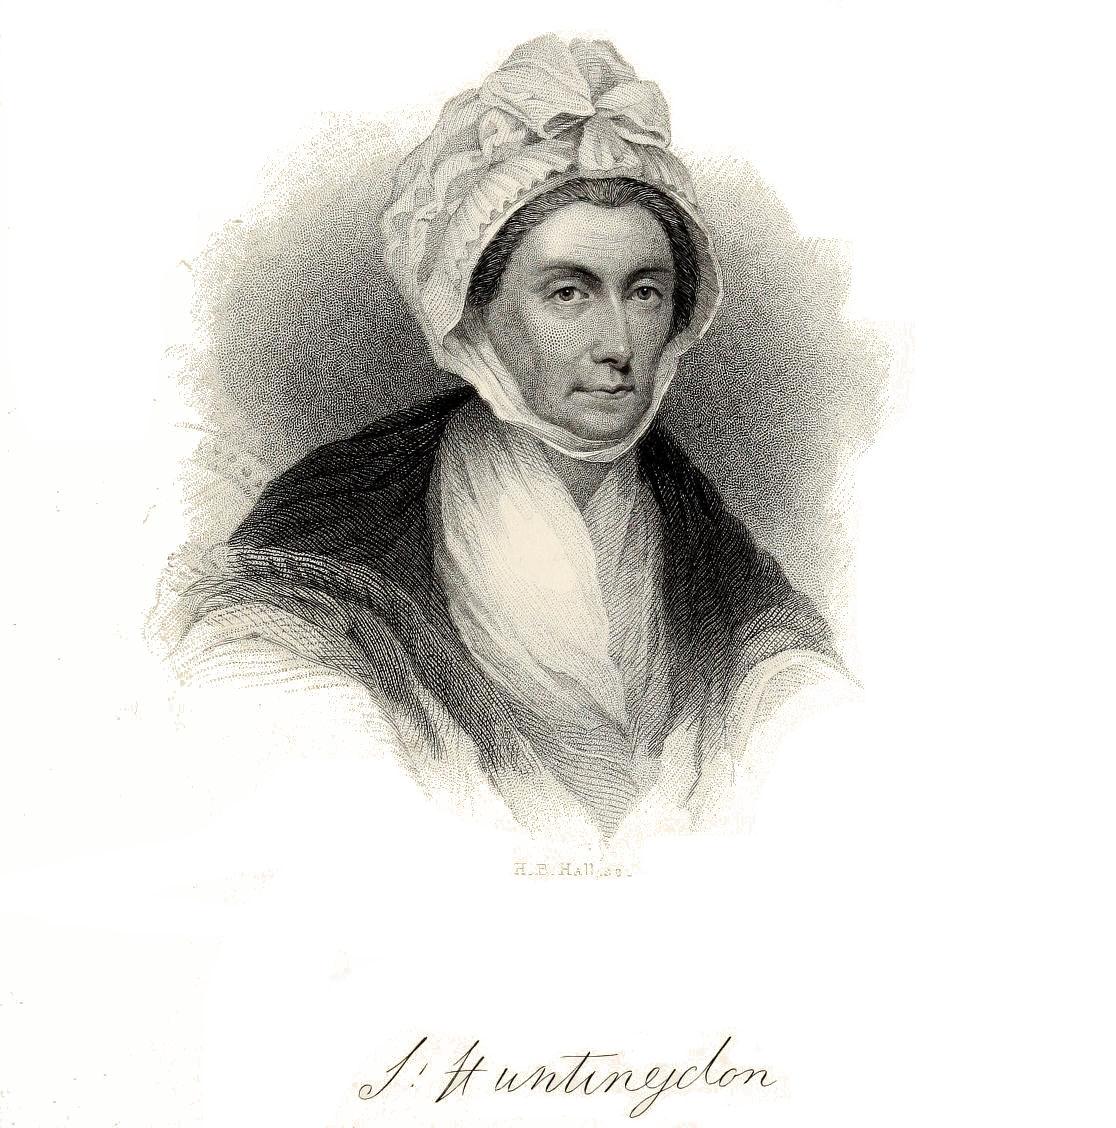 Lady Huntingdon